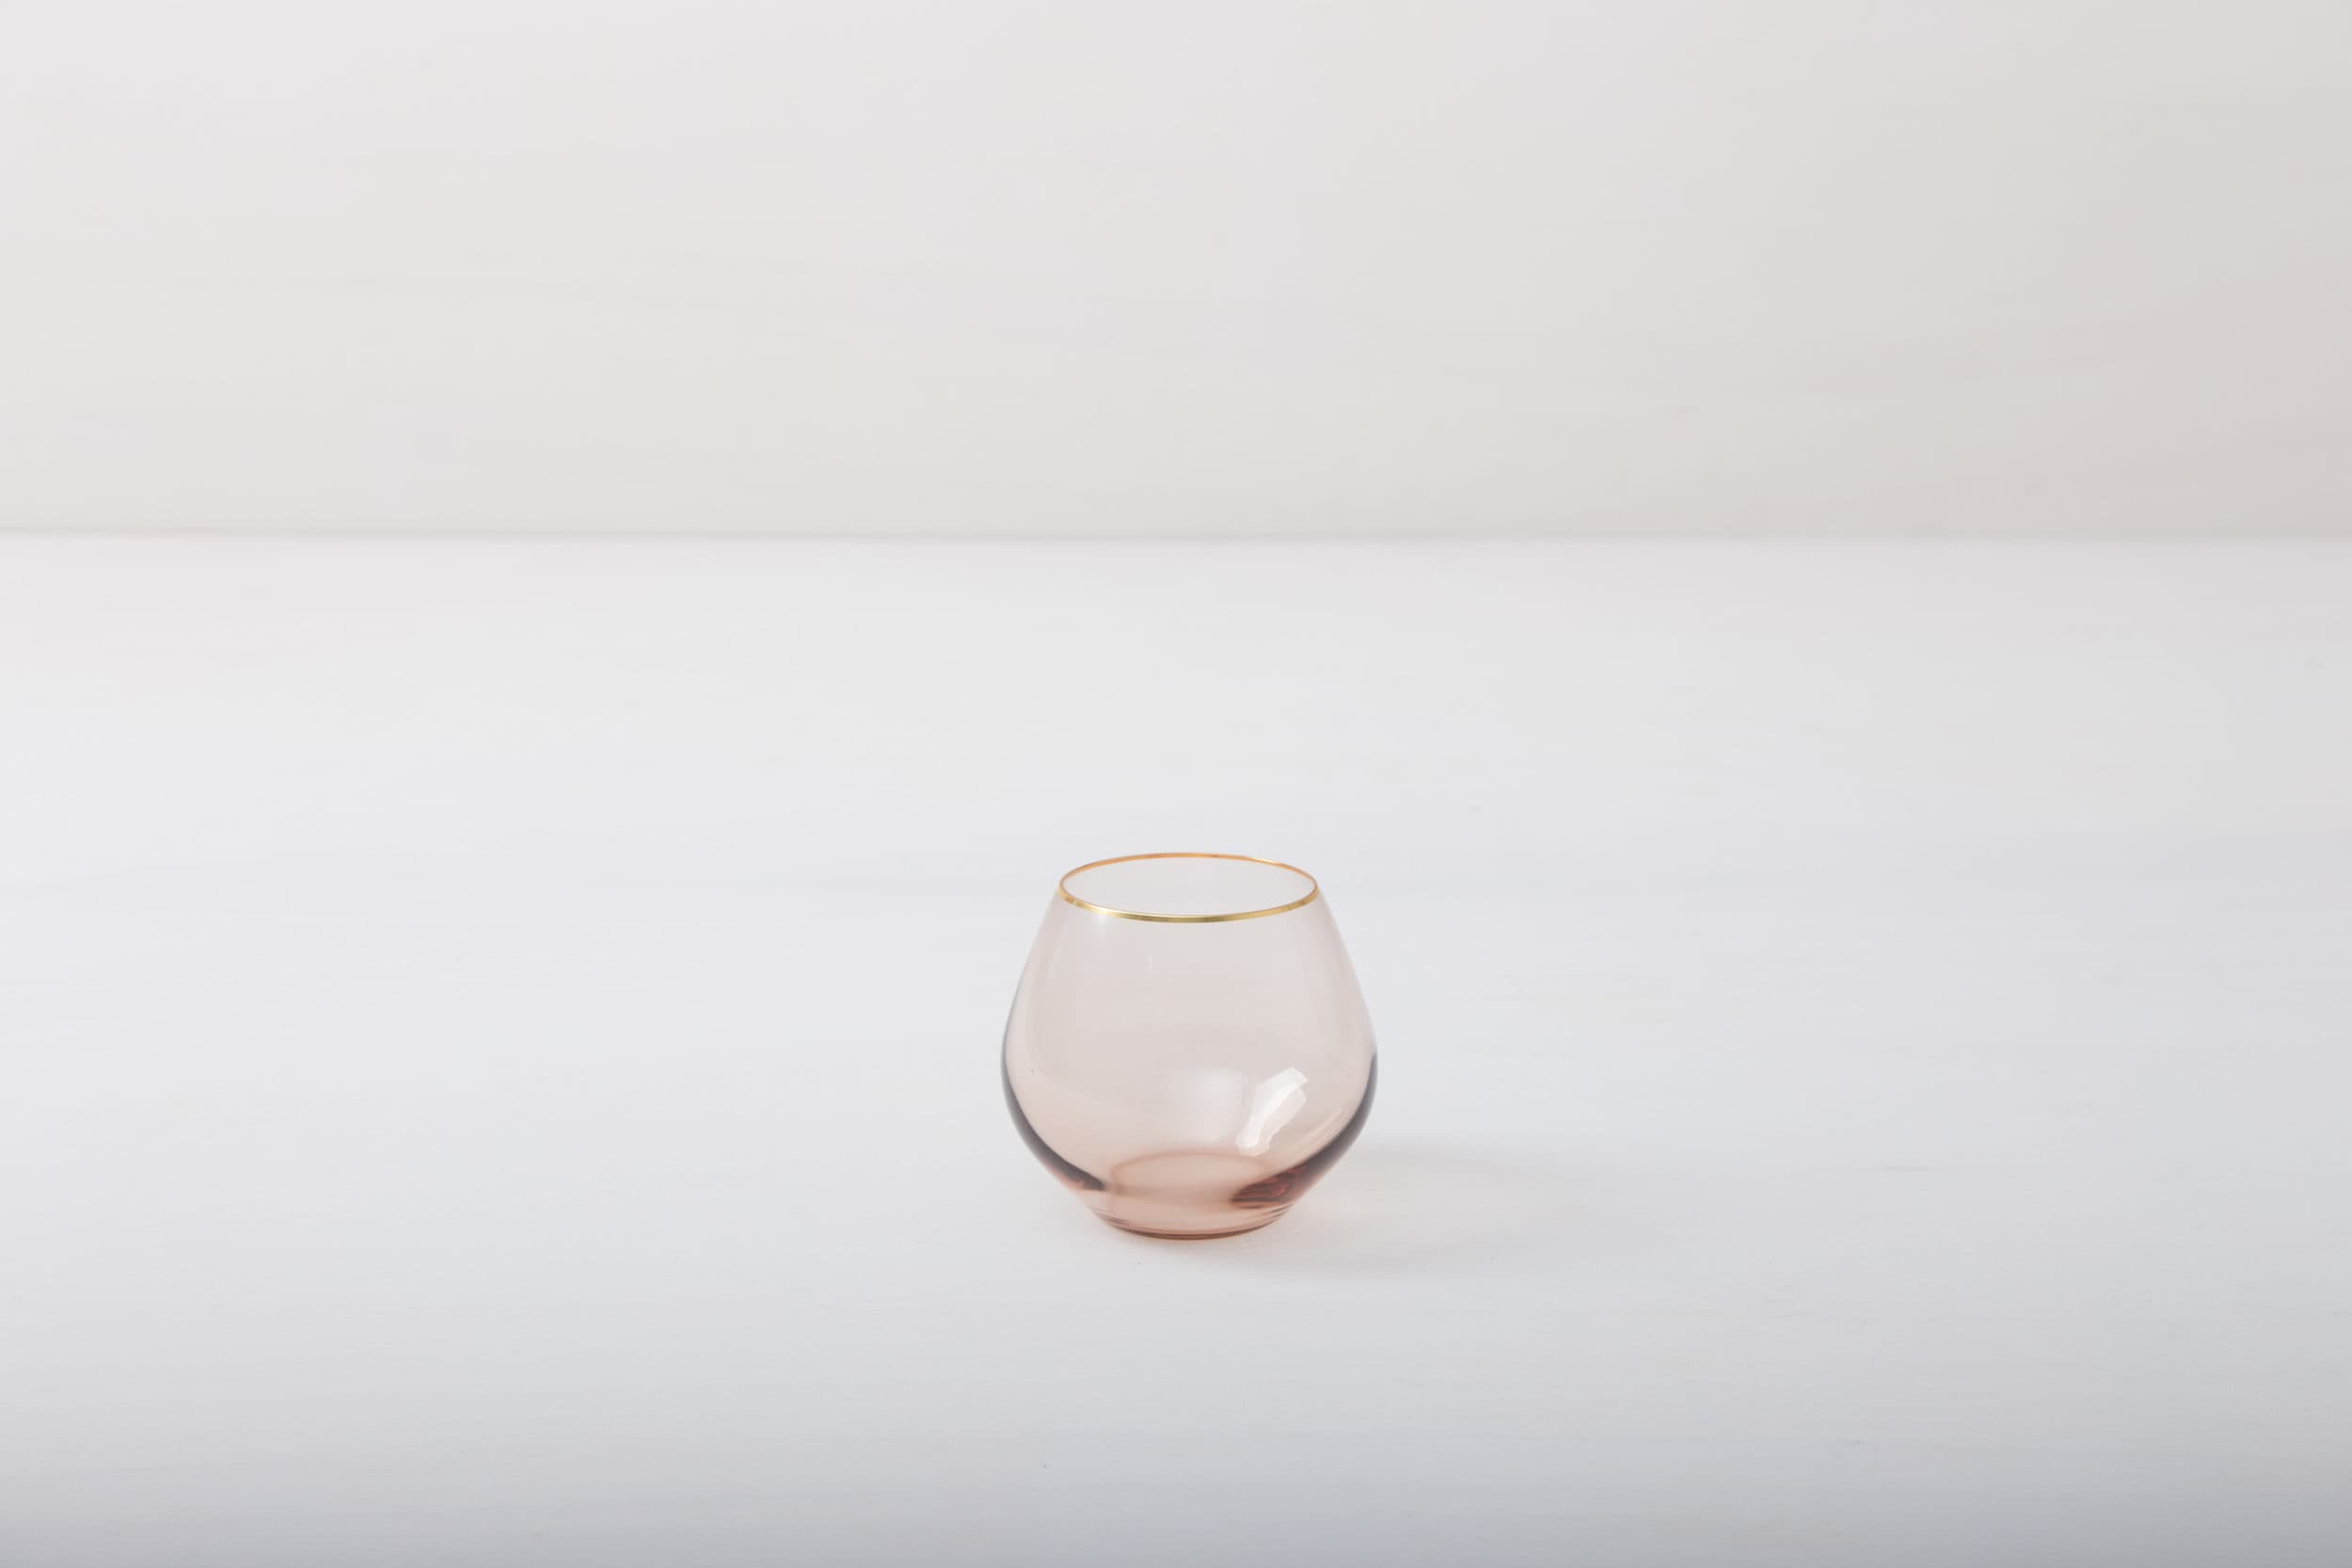 Miete rosa gefärbte Gläser, Glassware, Goldrand